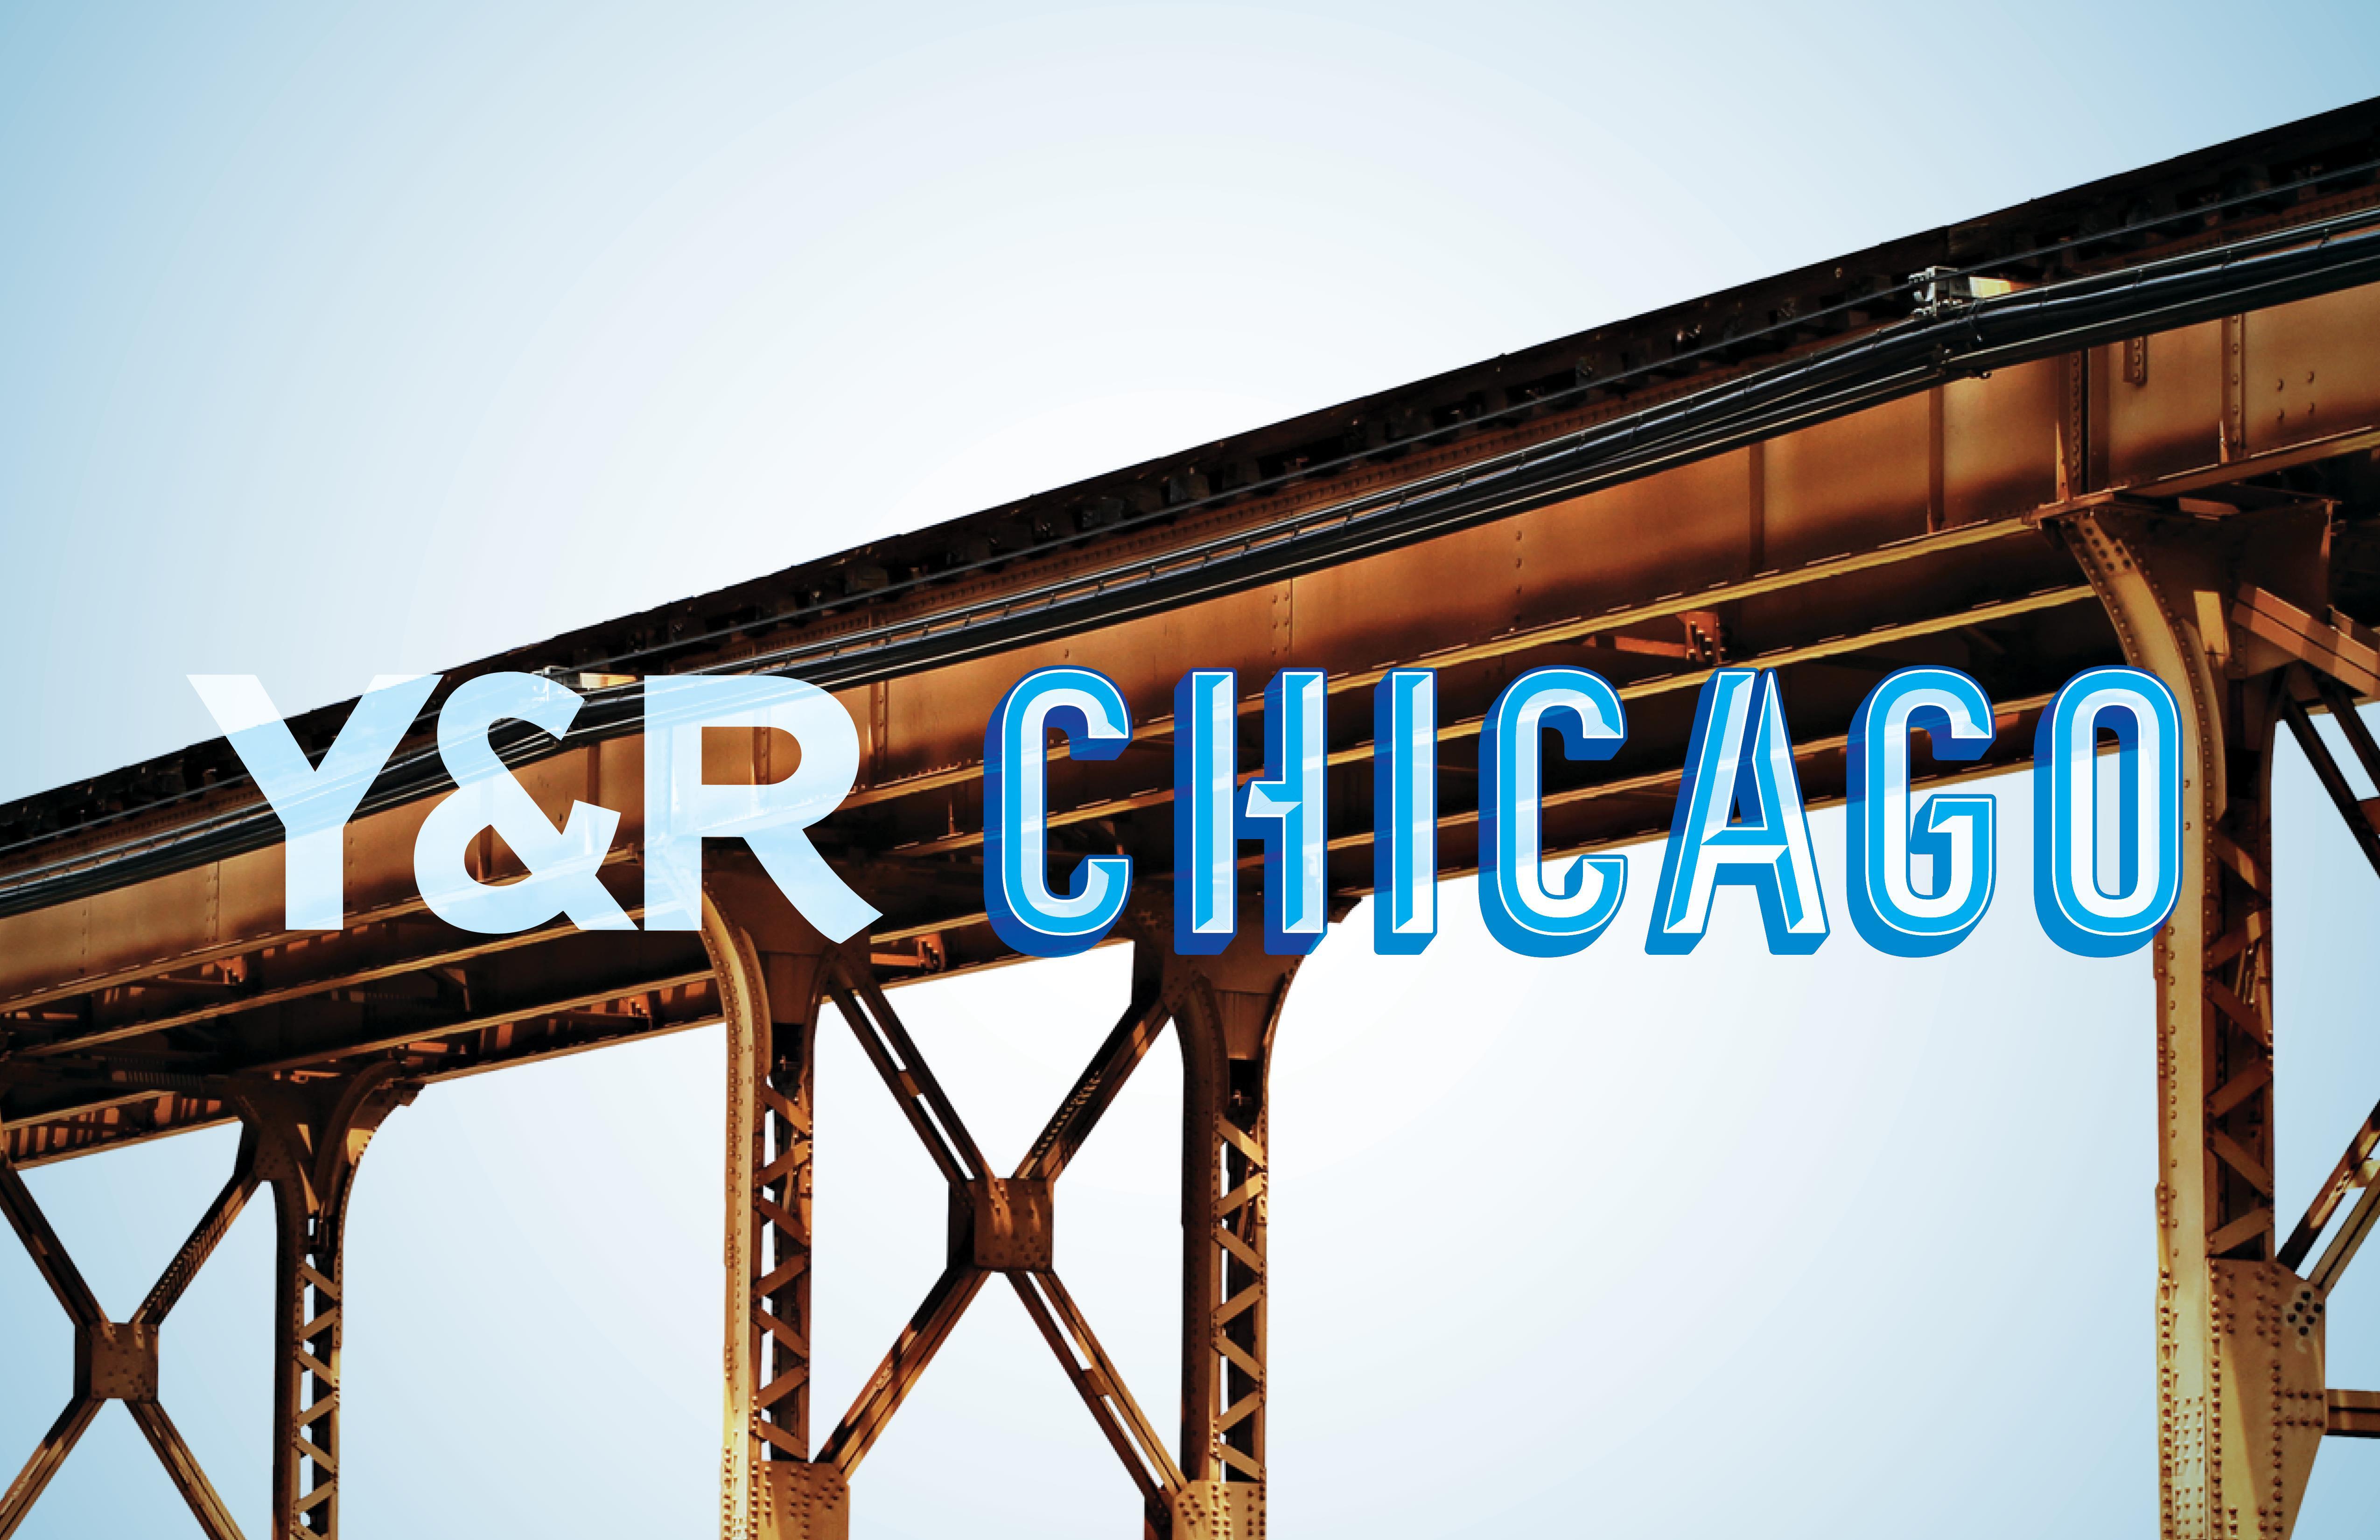 Y&R Chicago